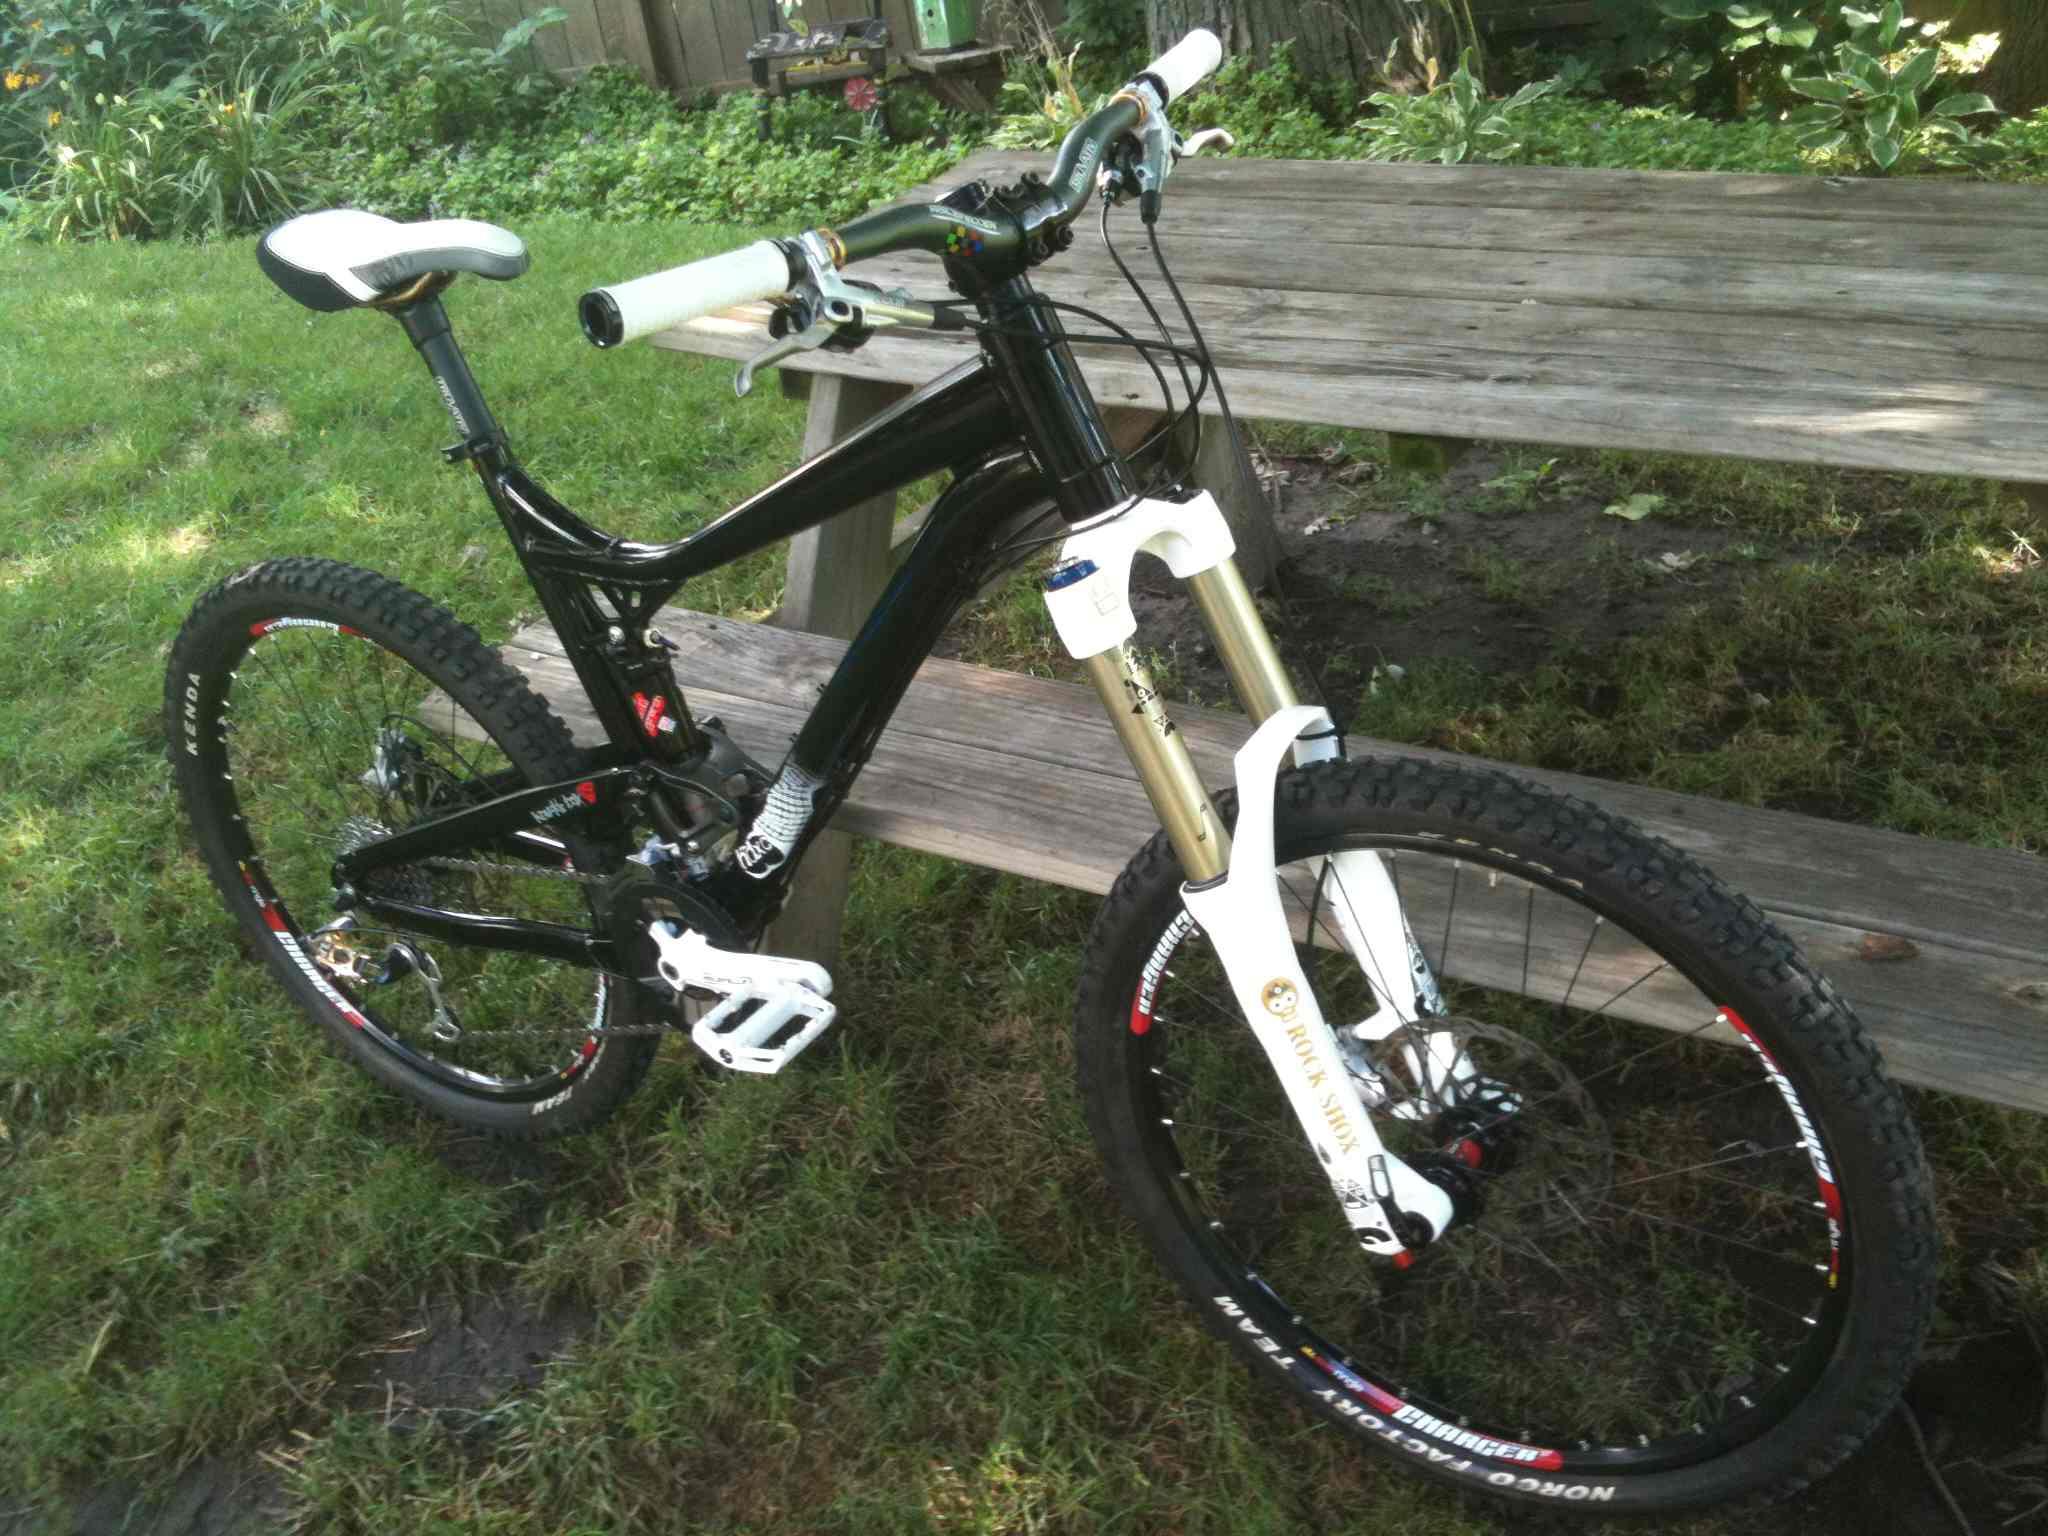 FOR SALE - DiamondBack Mission Mountain Bike | All Mountain